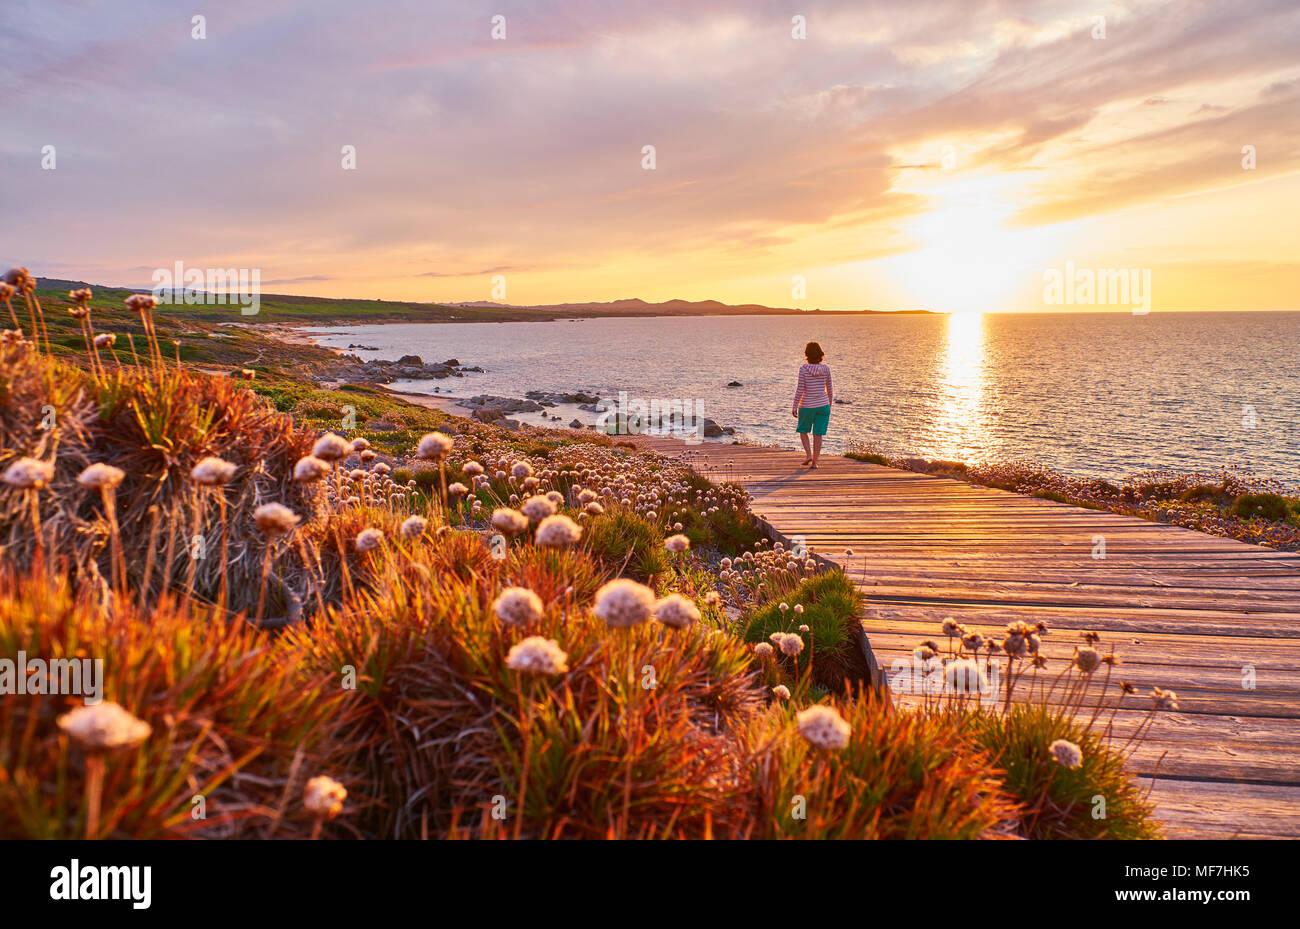 Italy, Sardinia, Lu Litarroni, senior woman on wooden boardwalk at sunset - Stock Image